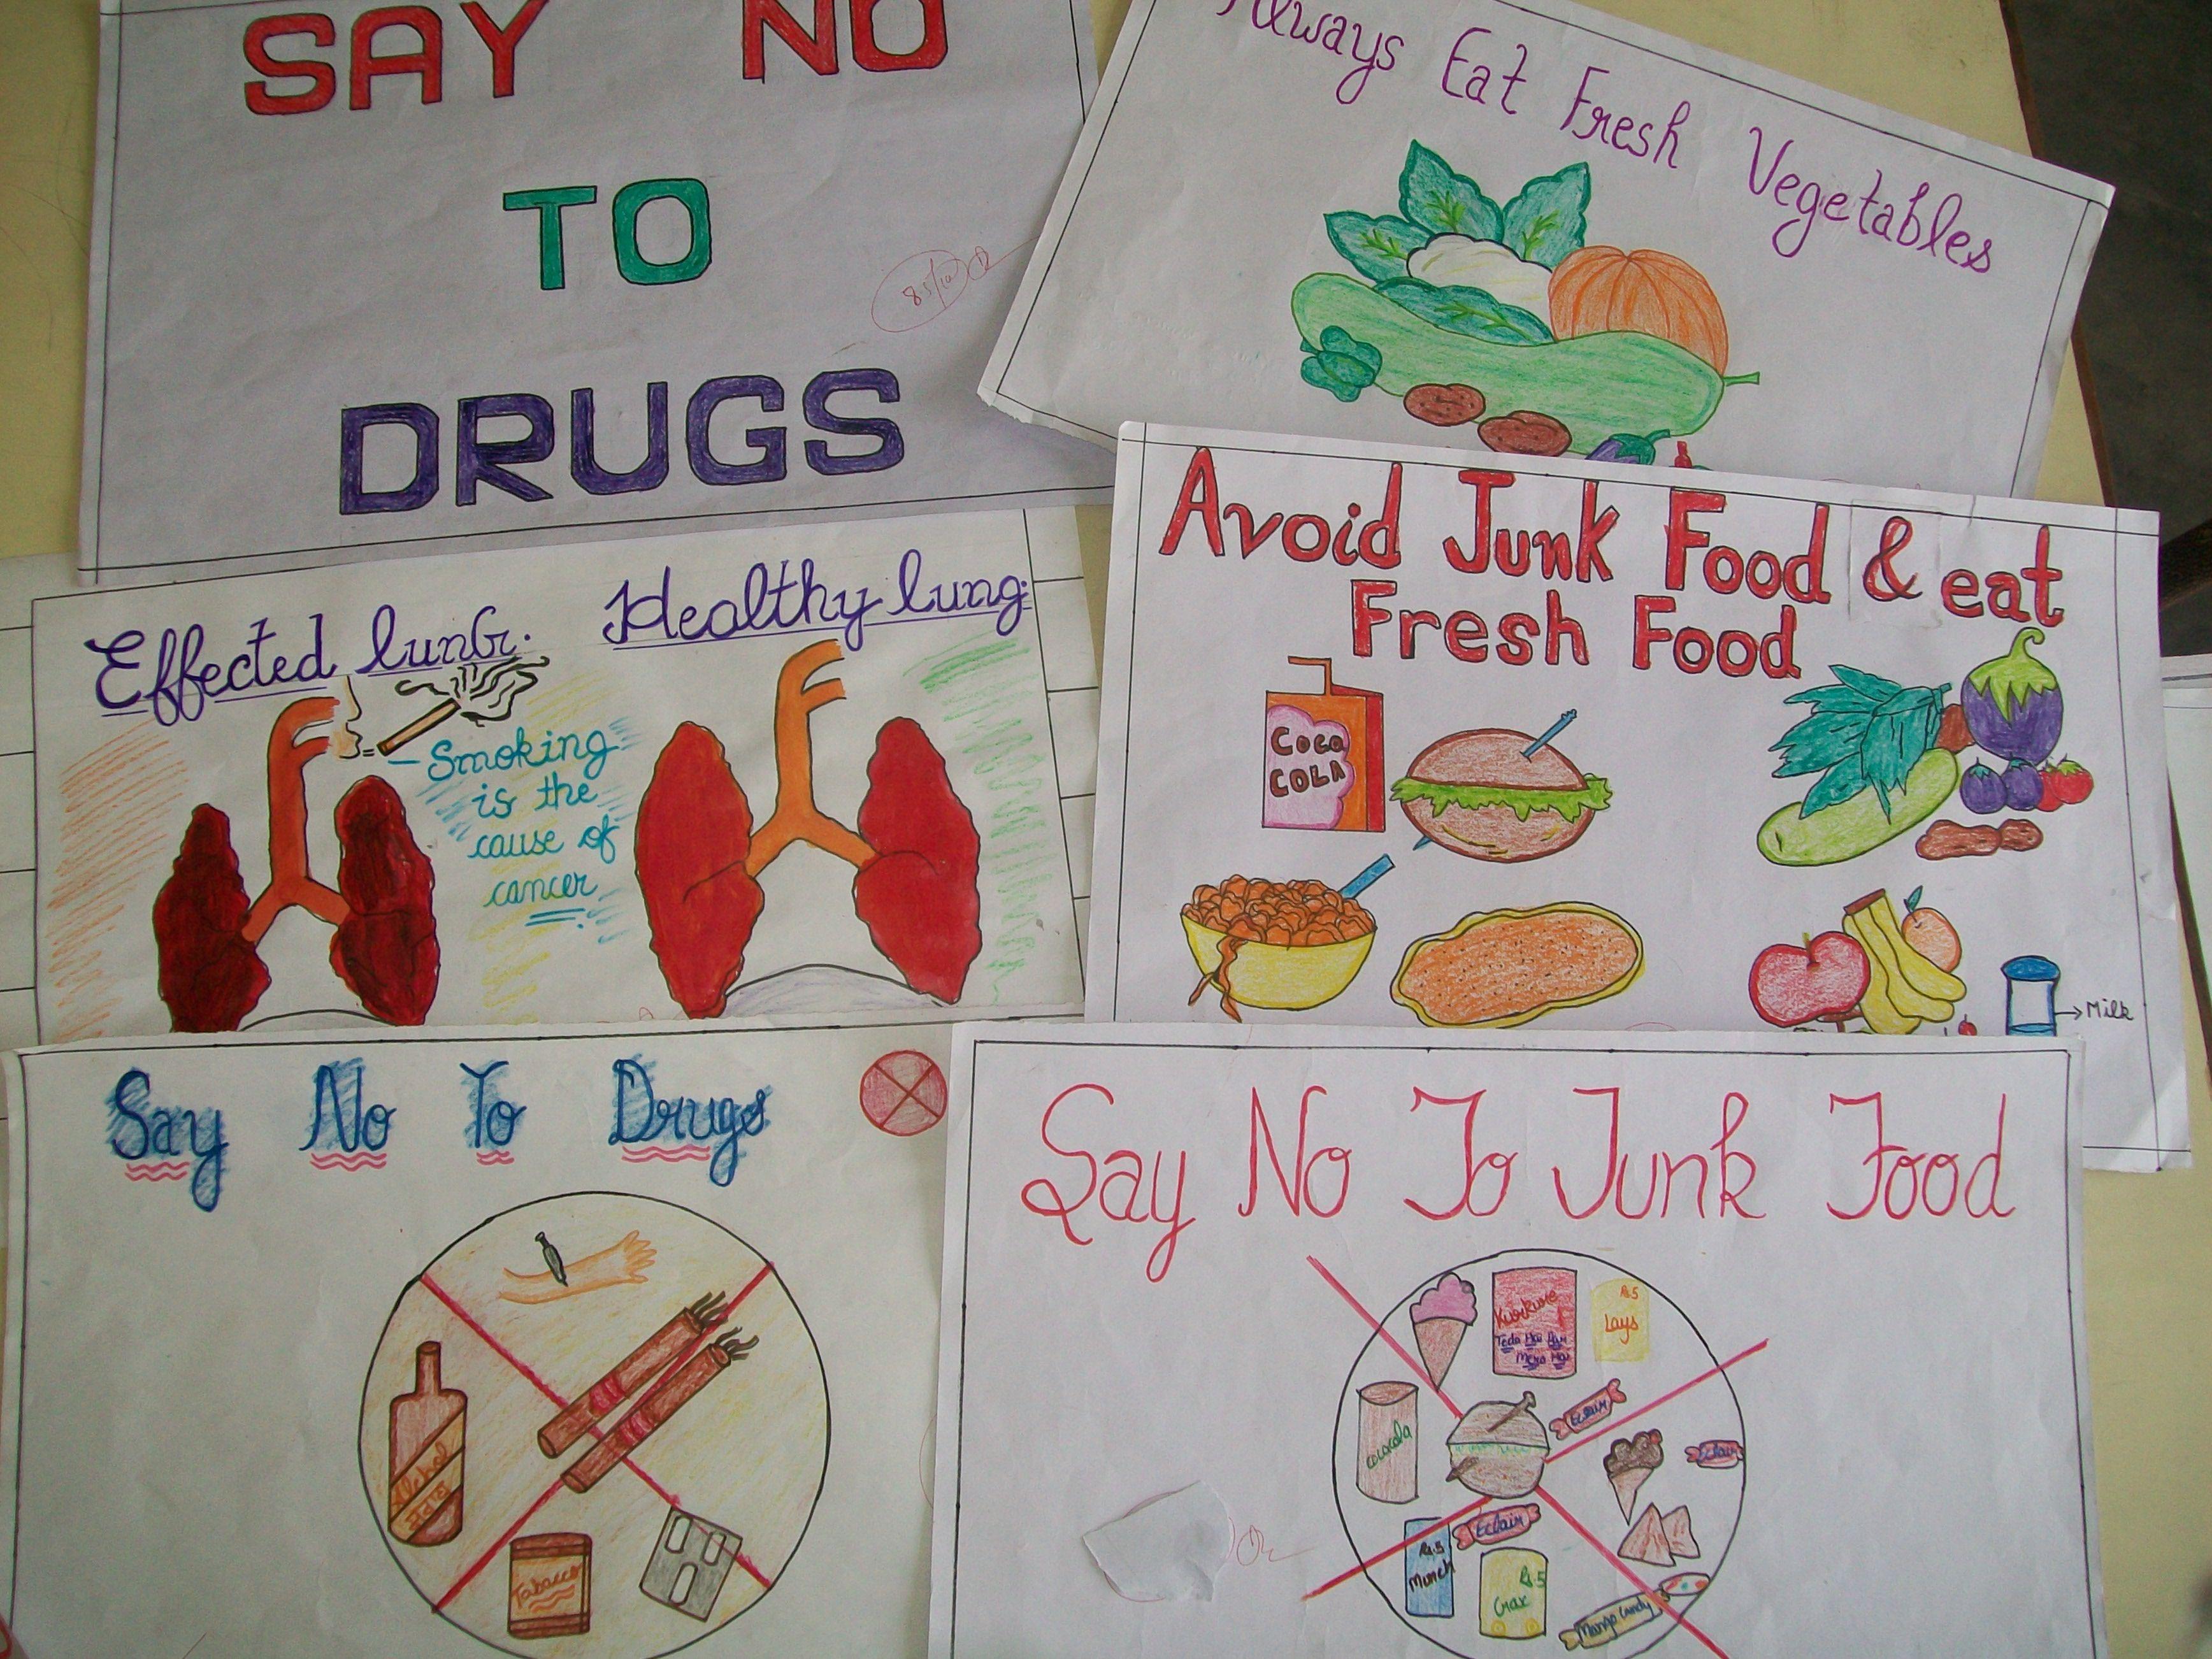 Drawn Advertisement health 12 3472 X 2604